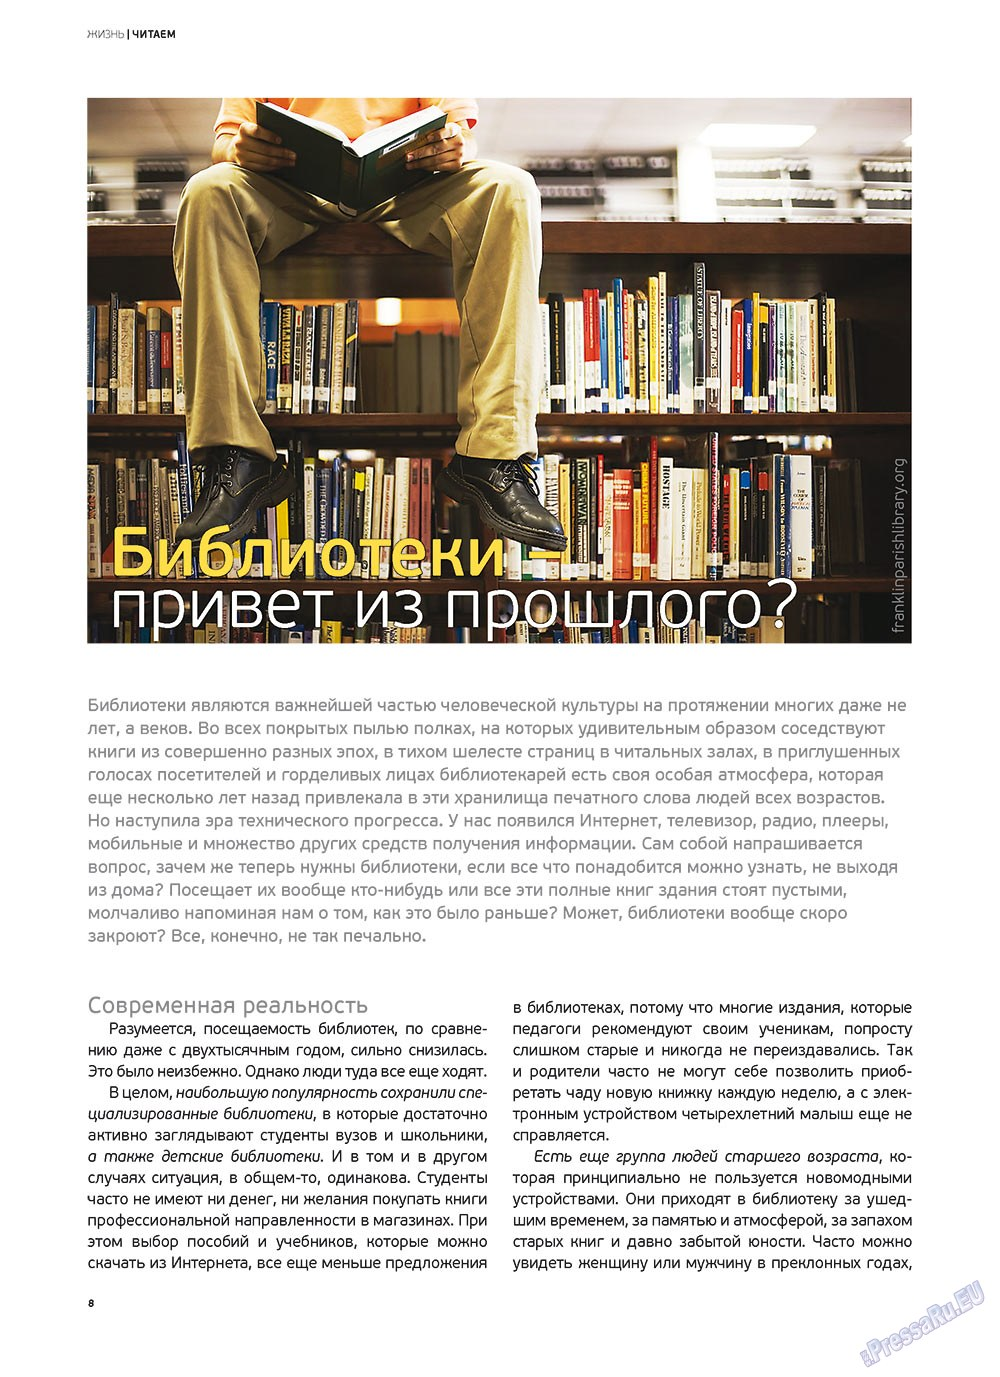 Артек (журнал). 2012 год, номер 3, стр. 10